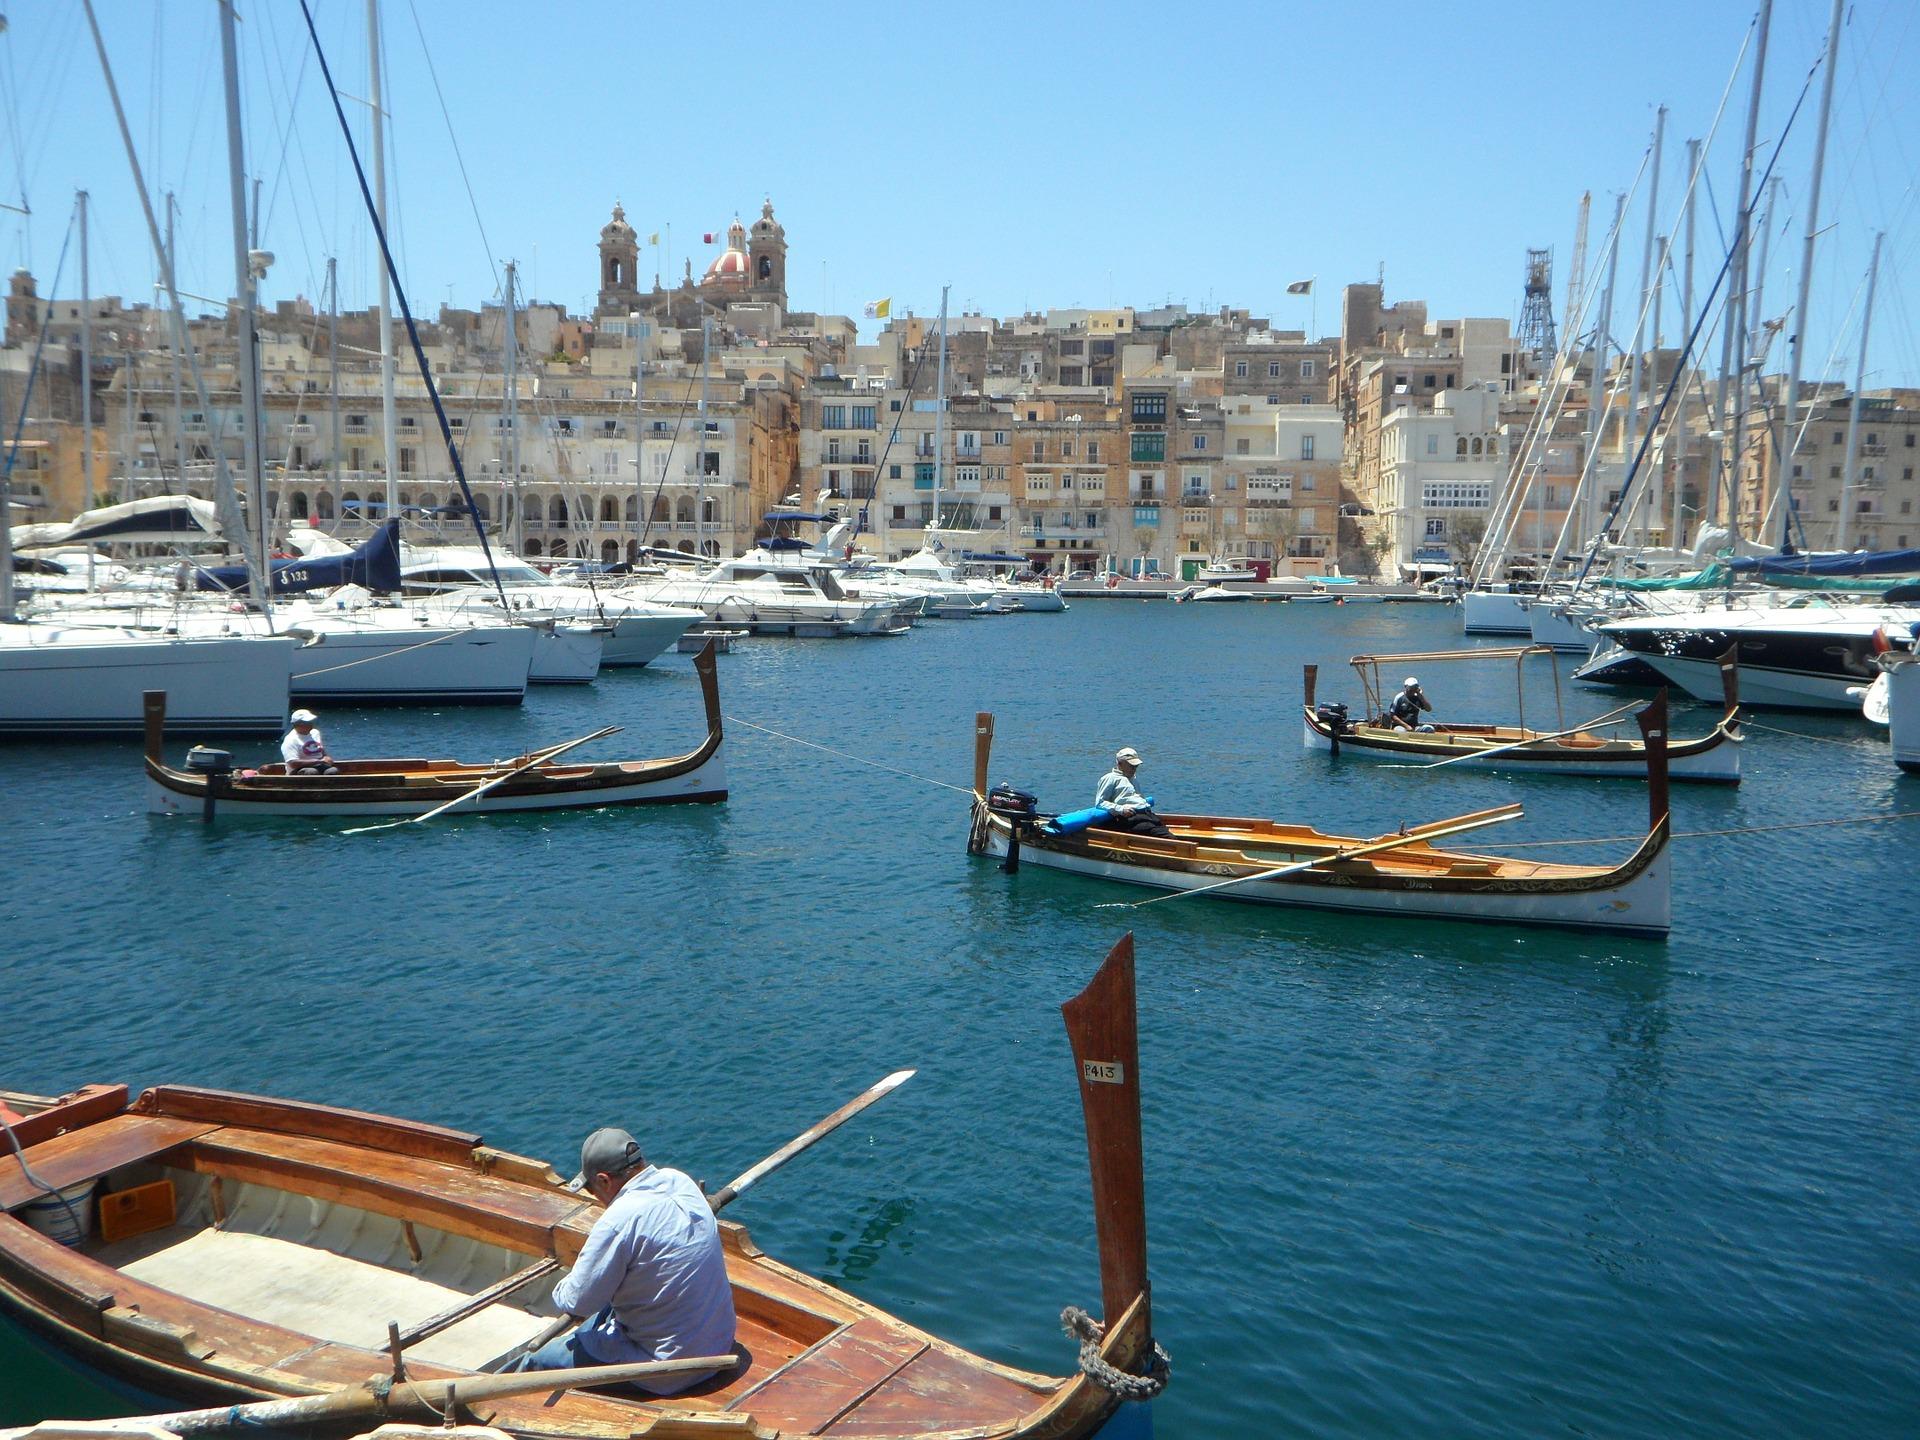 Port in Valletta, Malta